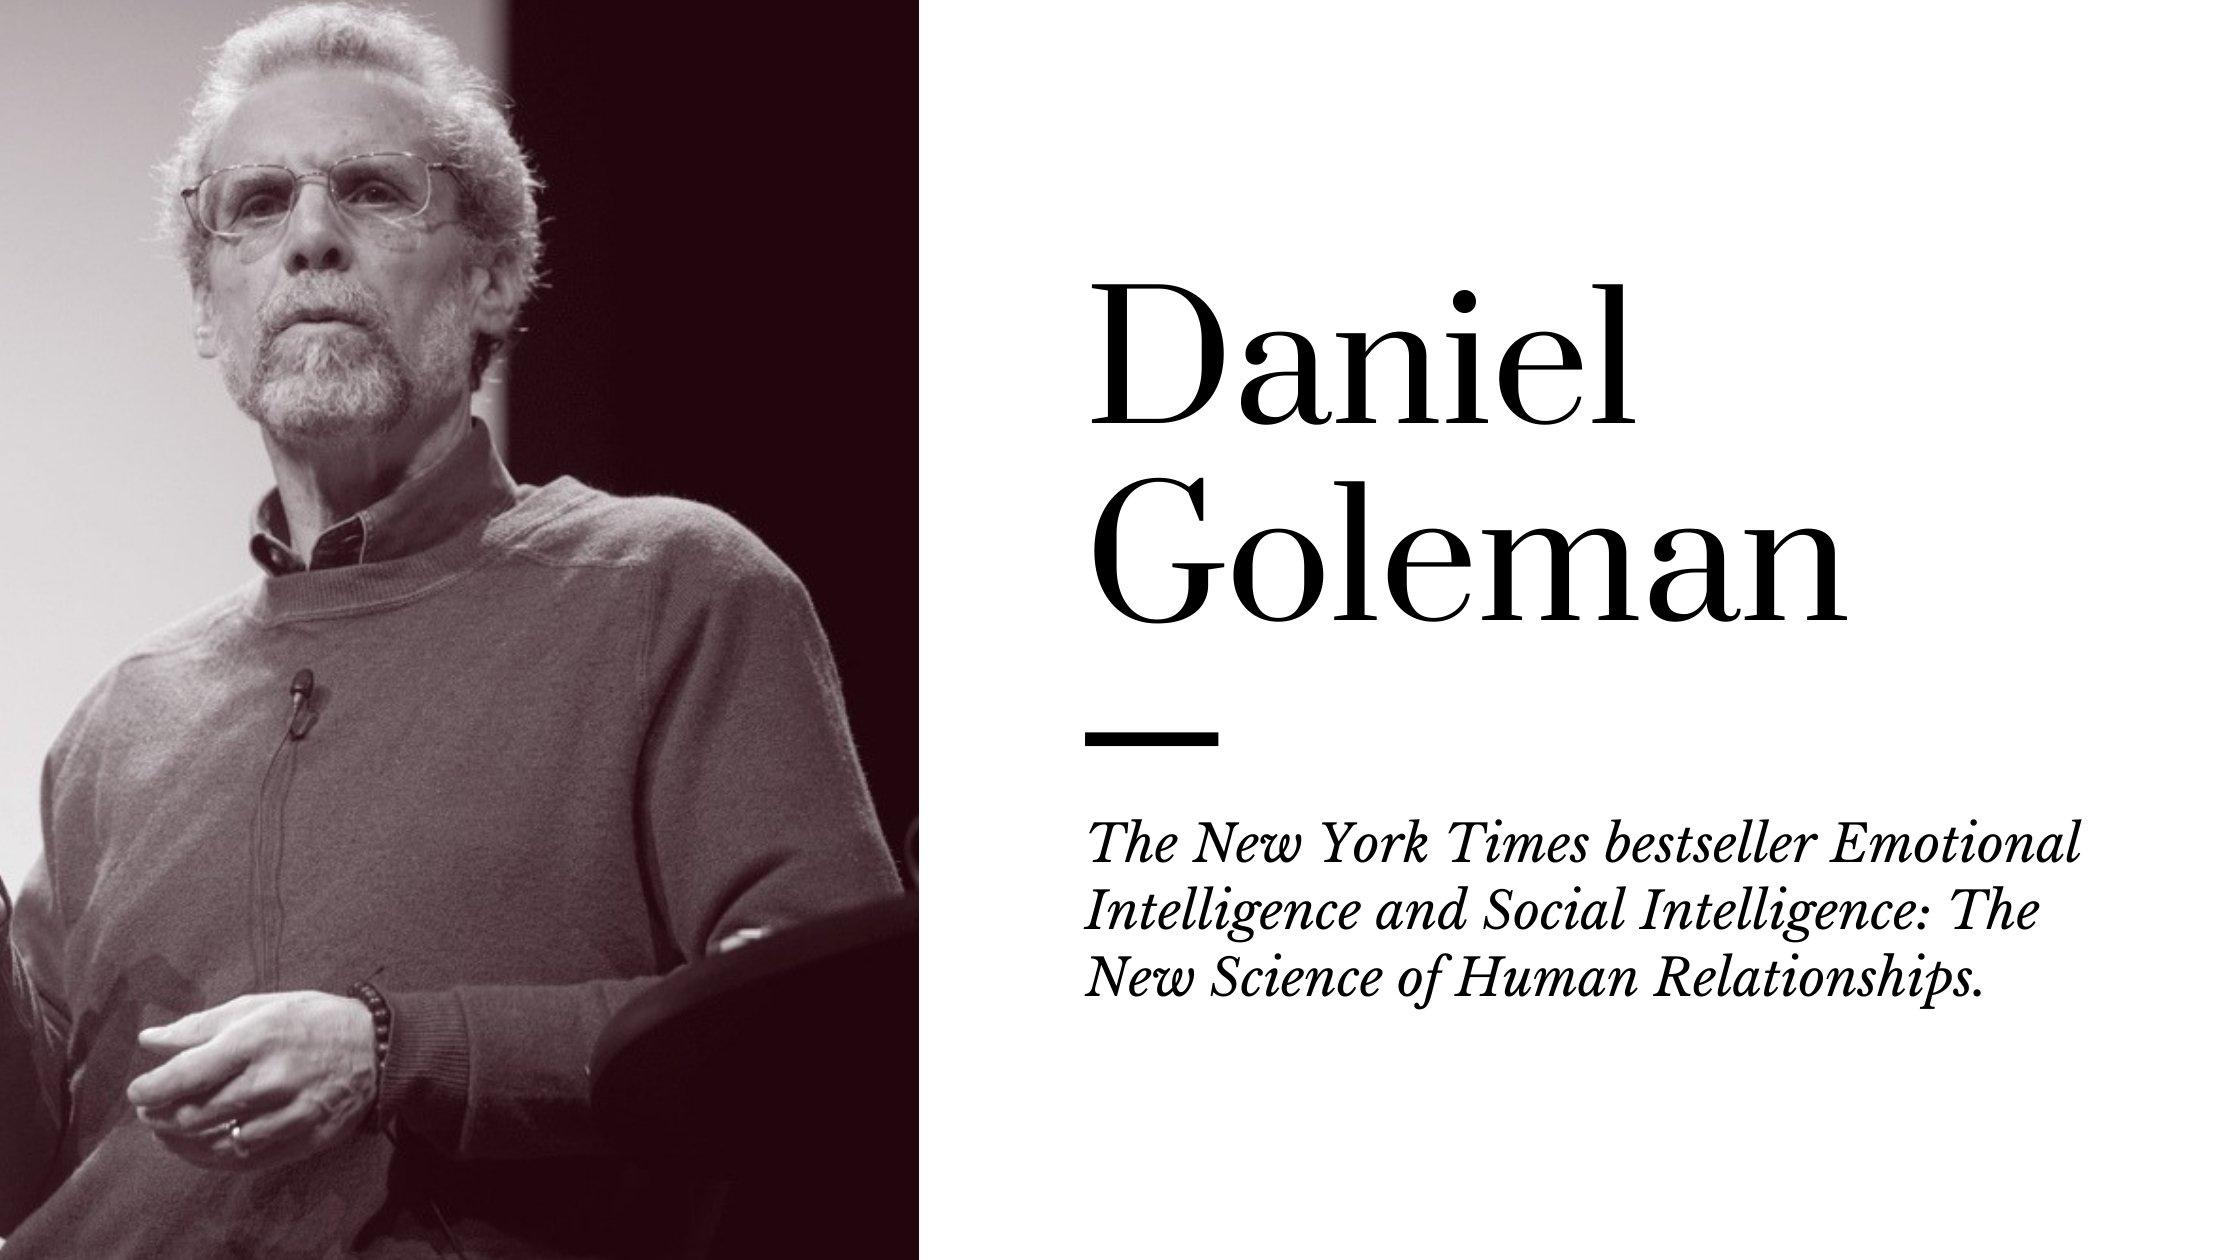 Best Books Written By Daniel Goleman